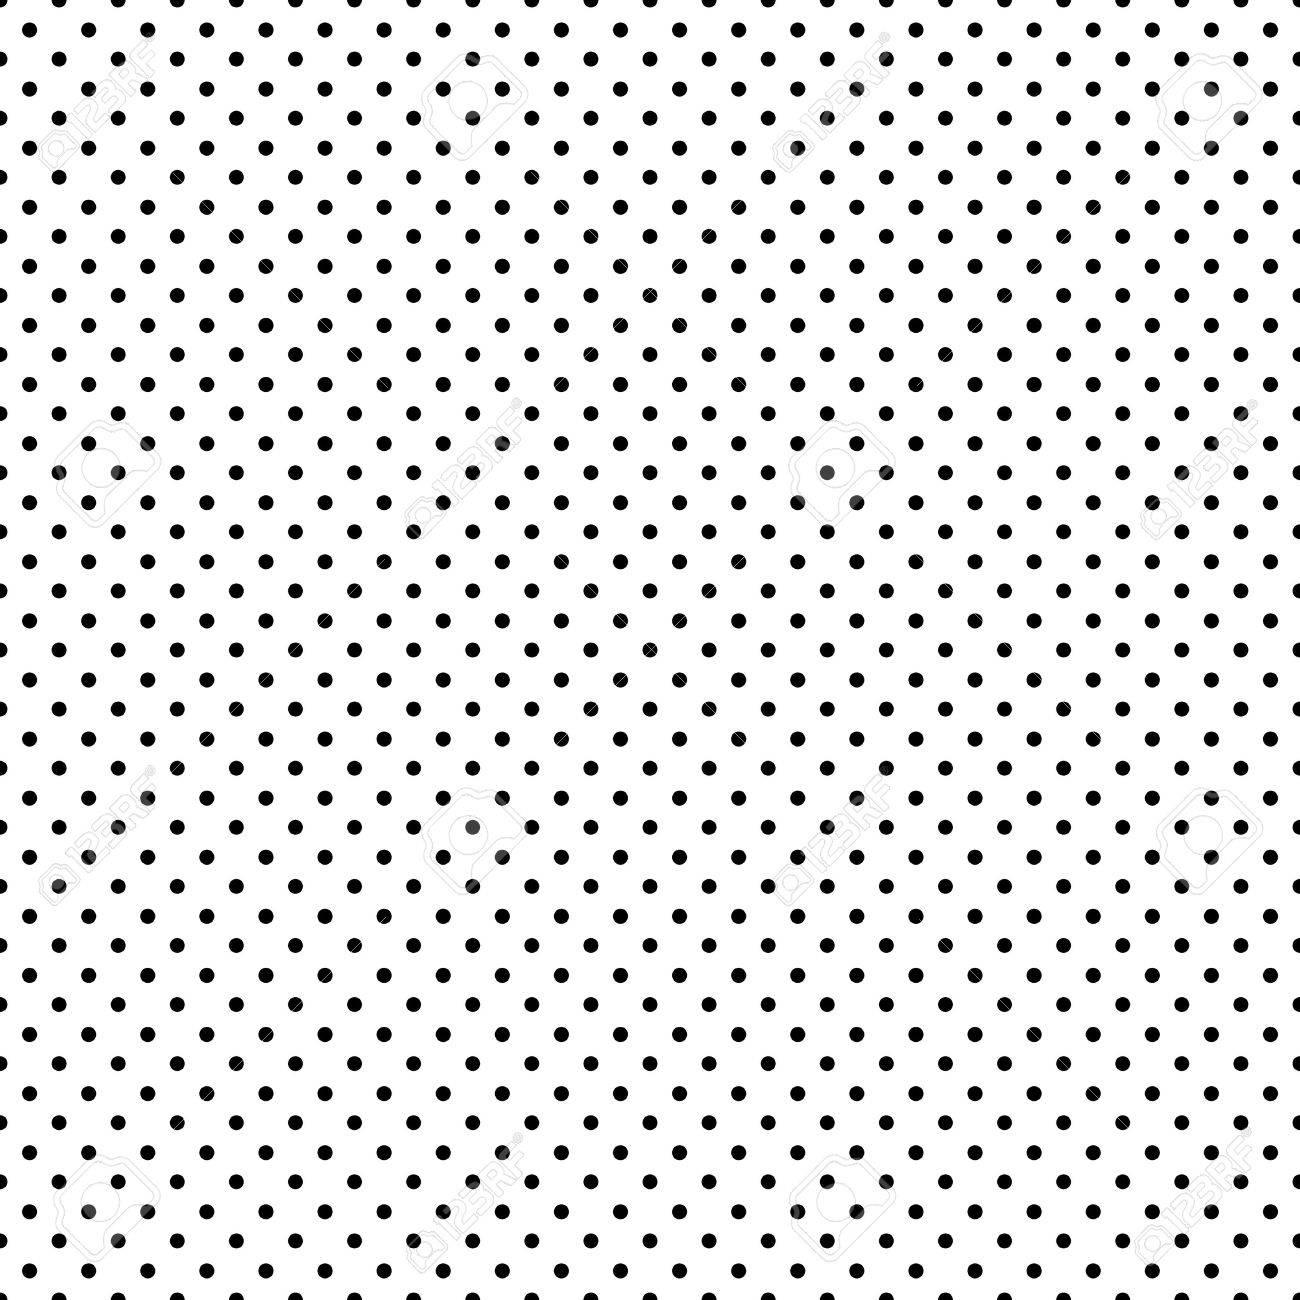 Seamless Pattern Stock Vector - 12797548